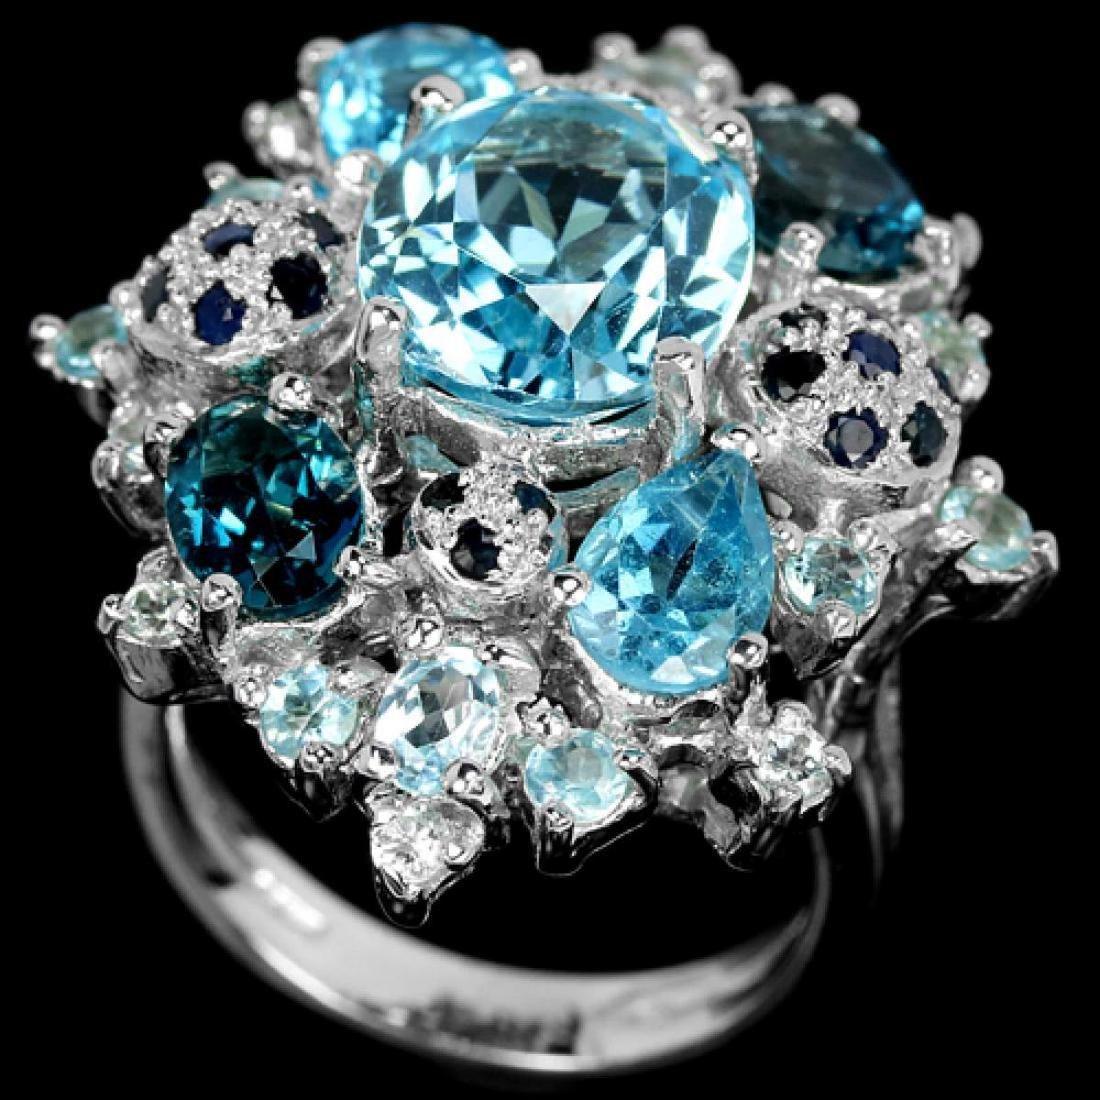 Natural SKY, SWISS & LONDON TOPAZ & BLUE SAPPHIRE Ring